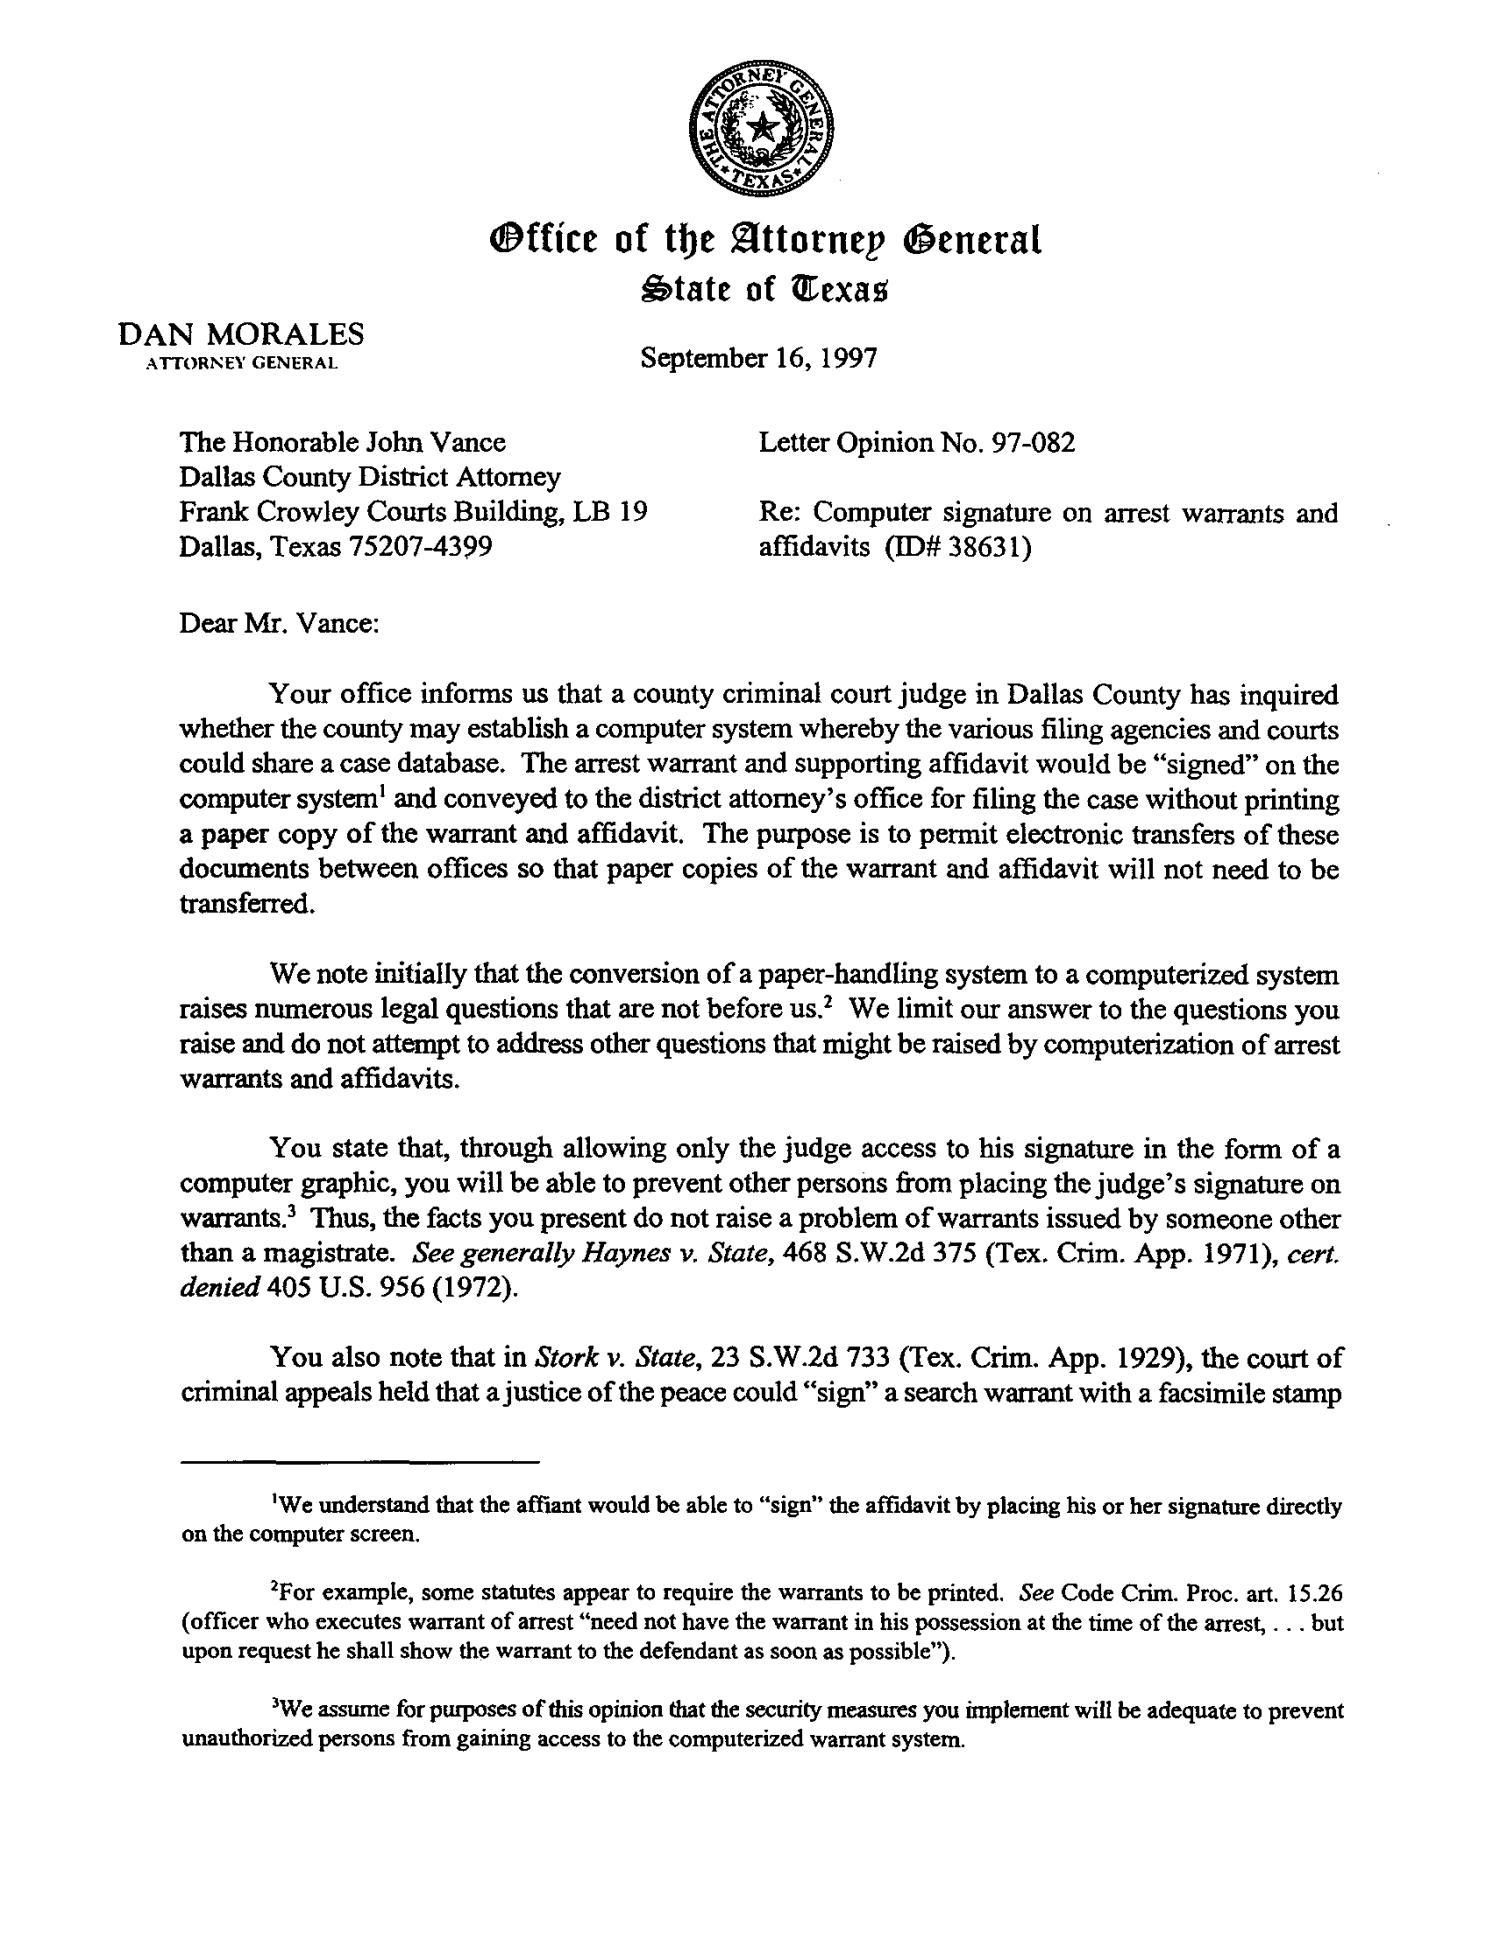 Texas Attorney General Opinion LO97 082